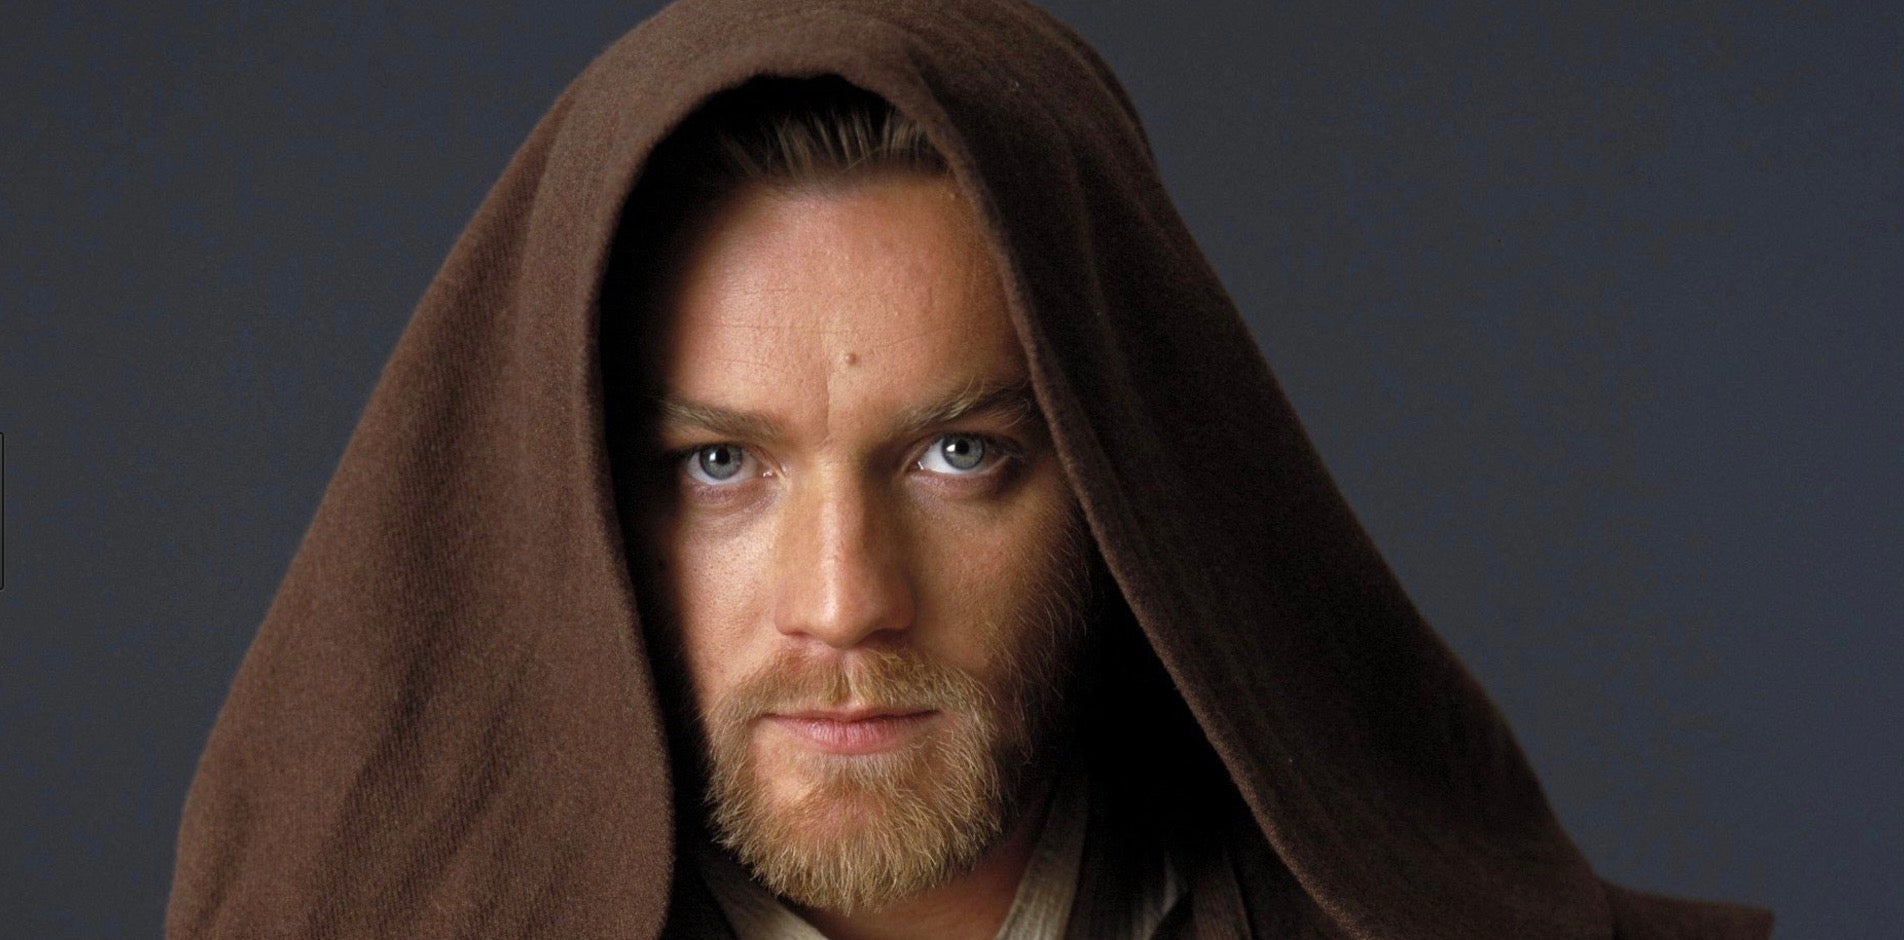 Do We Really Need An Obi-Wan Kenobi Standalone Movie?